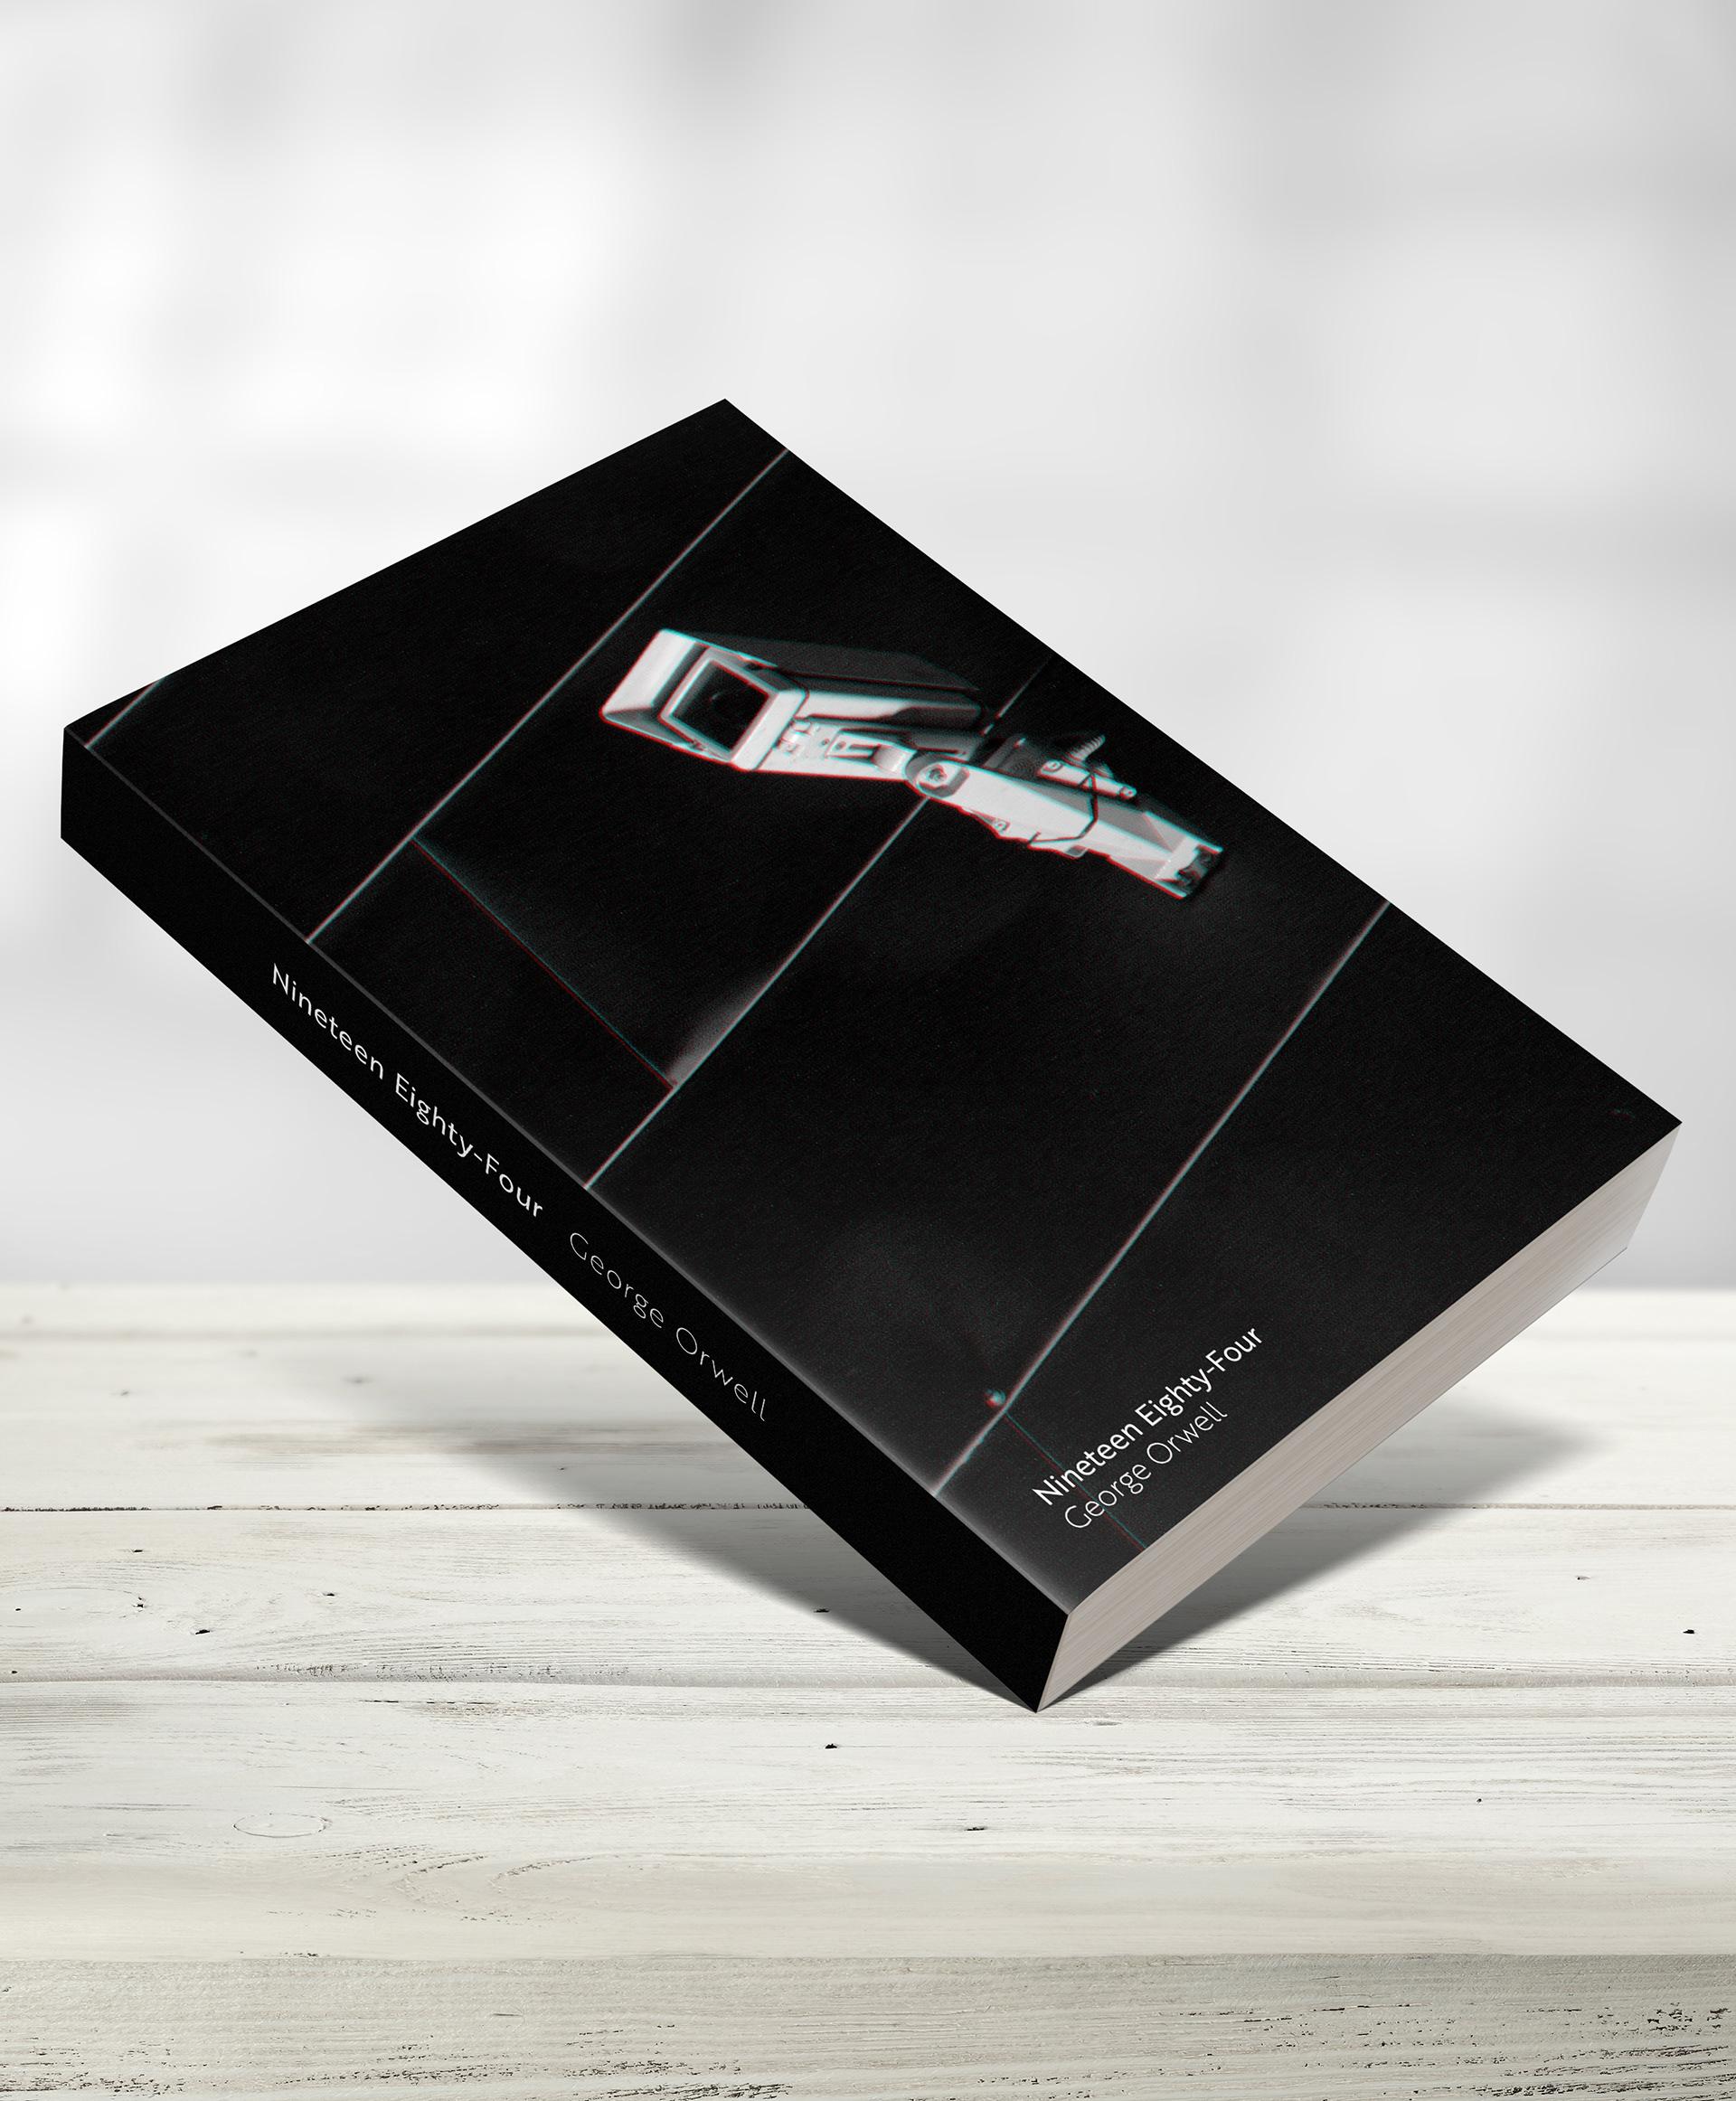 josh coleman graphic design portfolio book covers